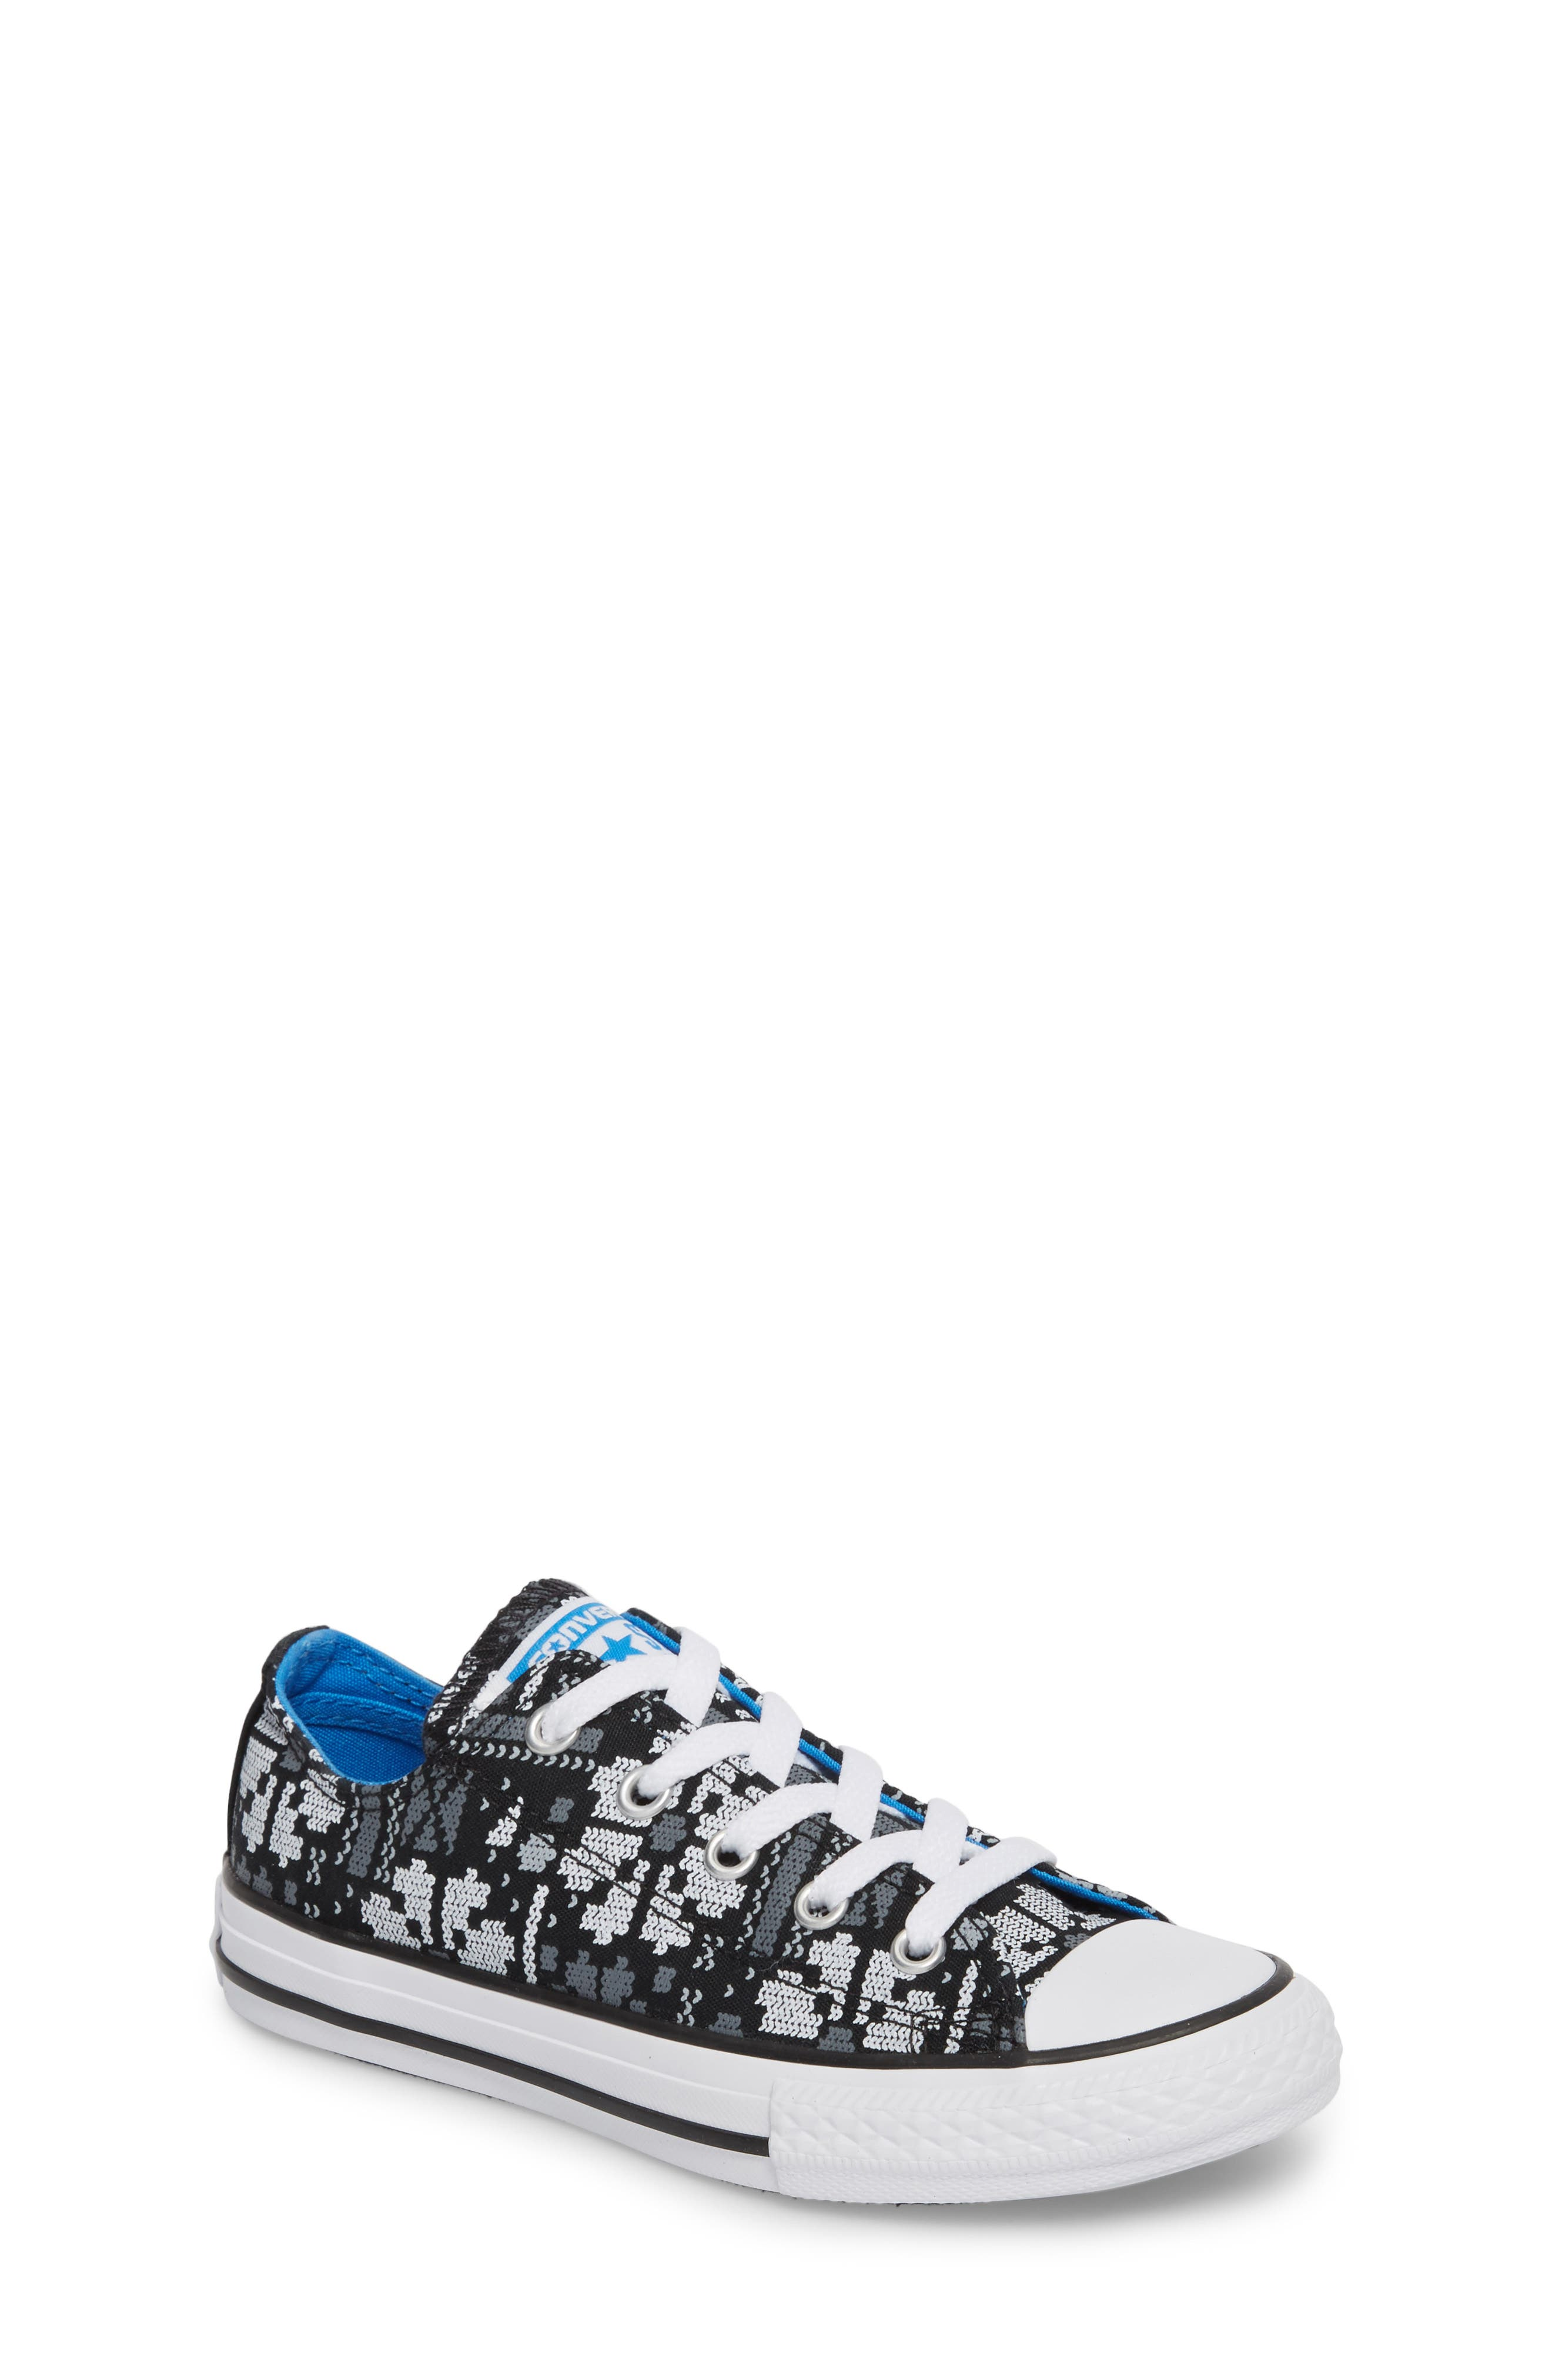 Main Image - Converse Chuck Taylor® All Star® Winter Ox Sneaker (Toddler, Little Kid & Big Kid)